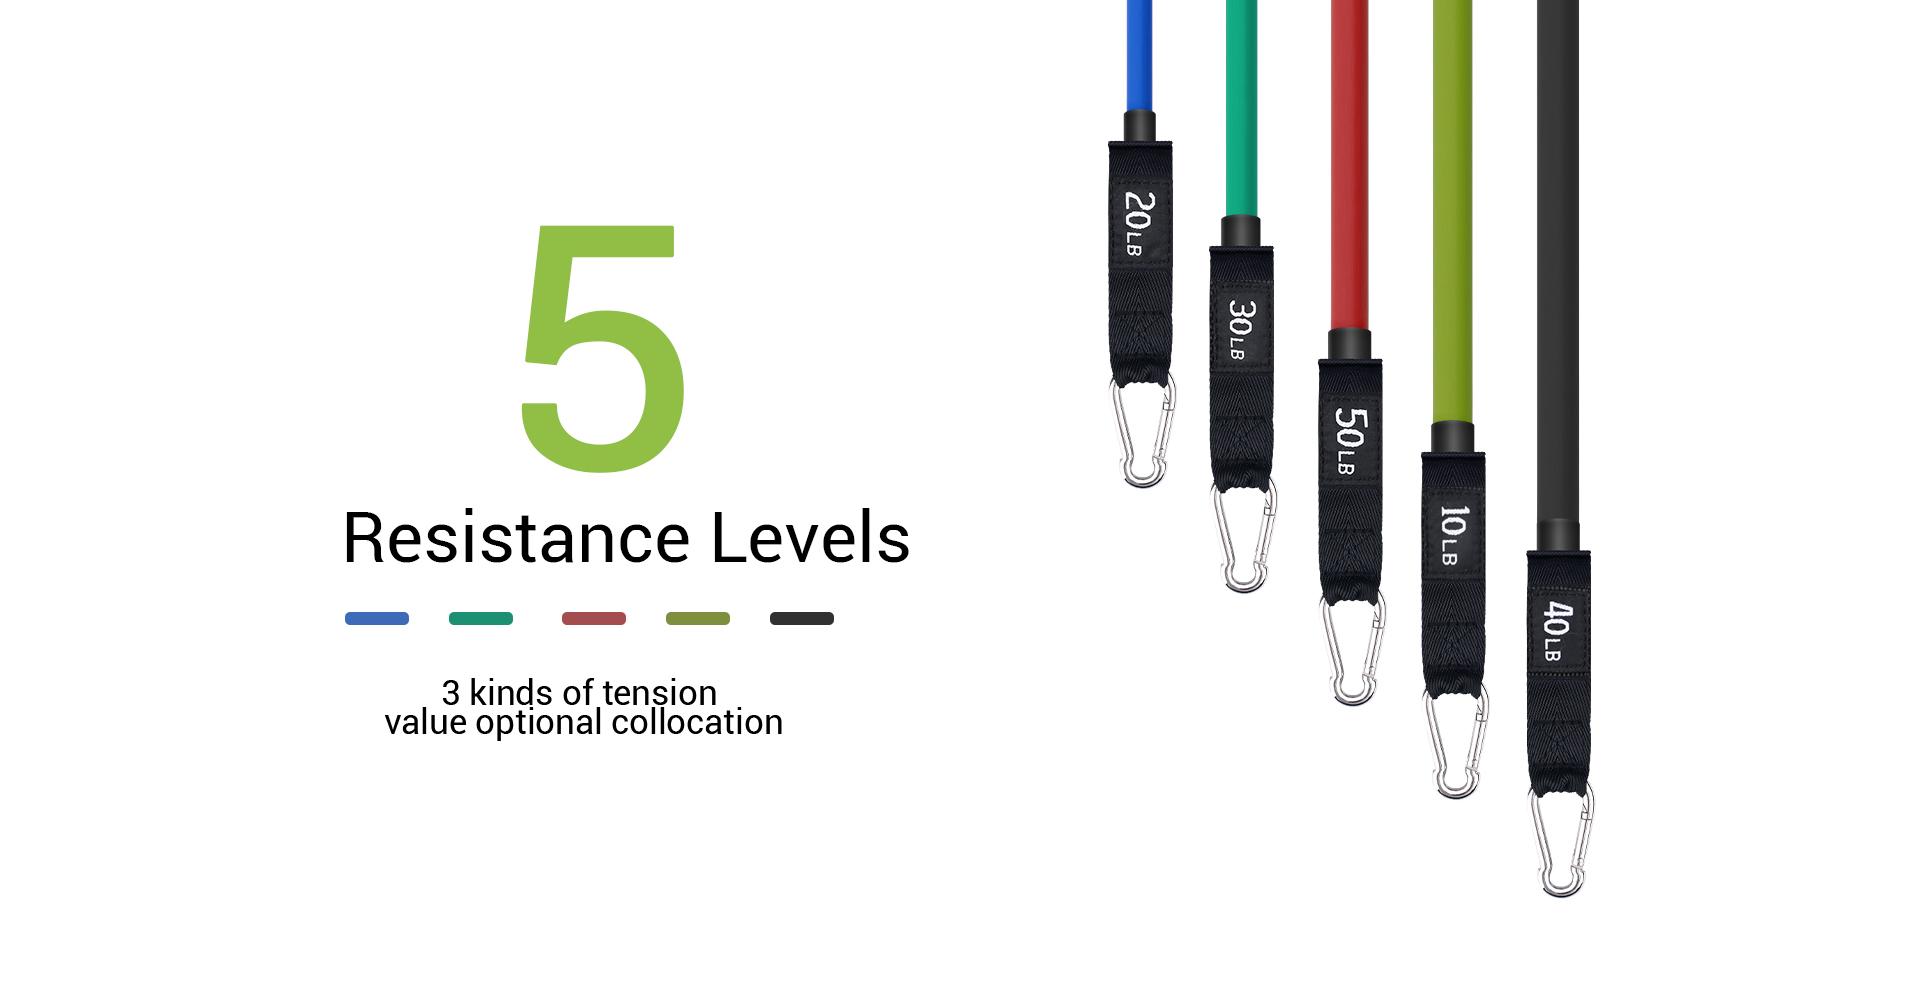 5 resistance levels